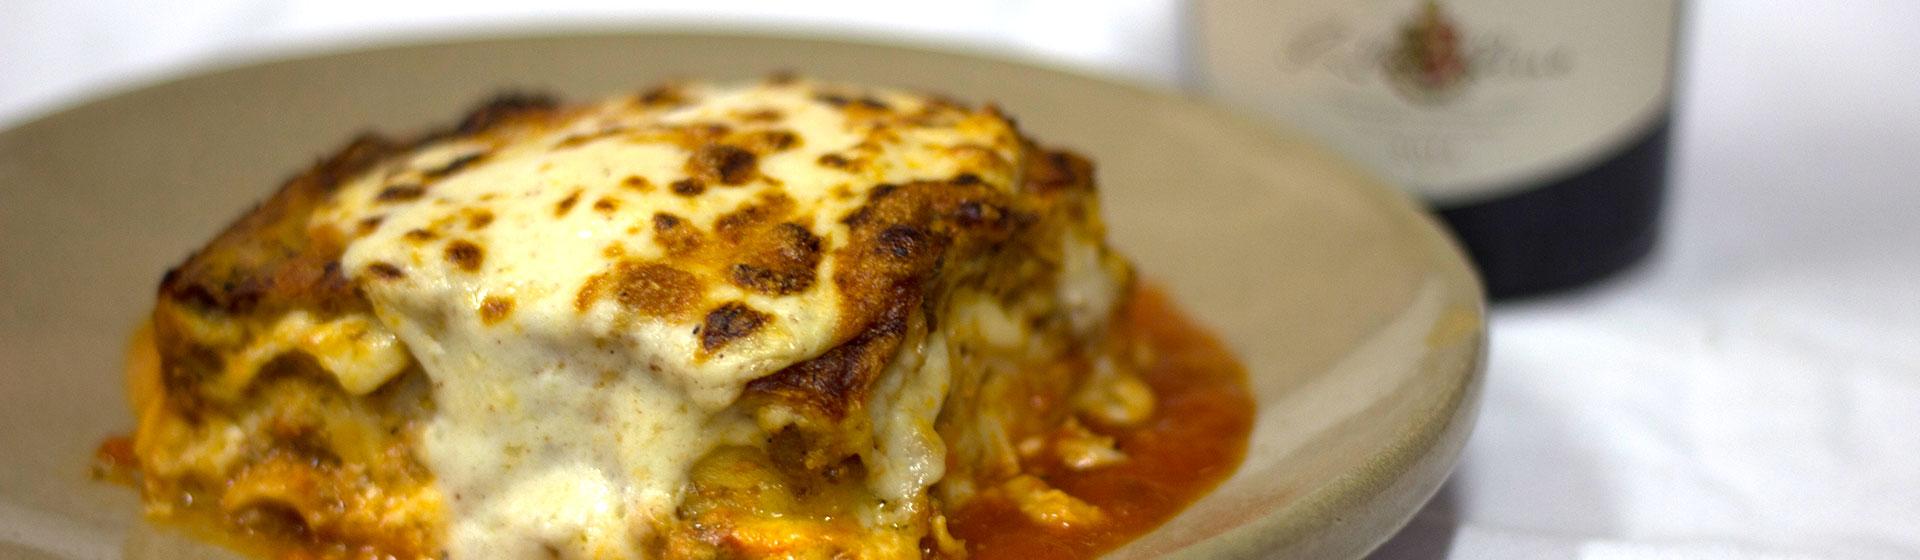 slide_home_02_pizzeria_restaurante_erik_lanzarote